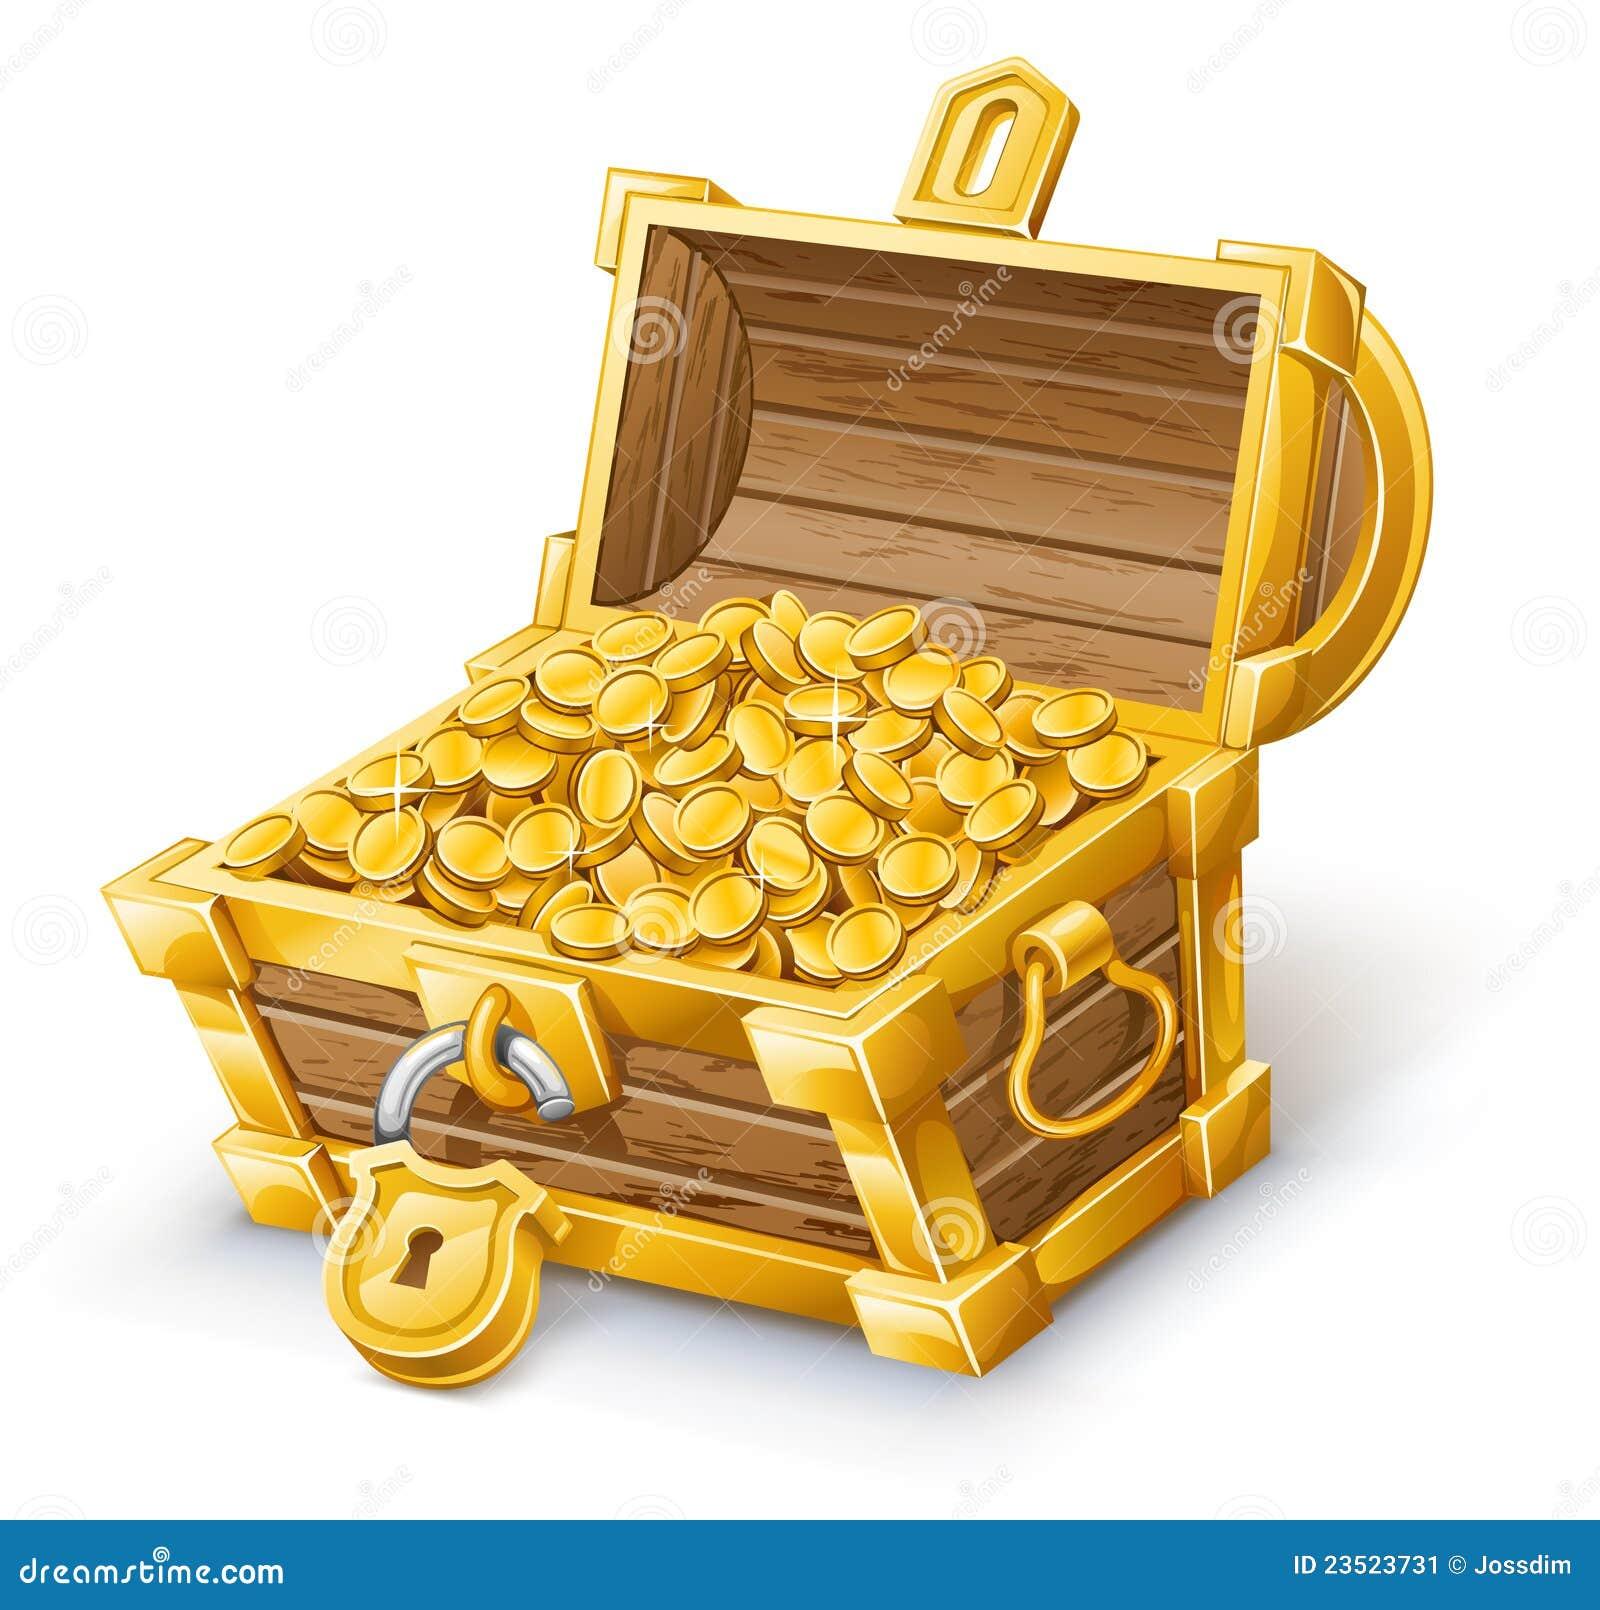 Vector illustration of treasure chest on white background.